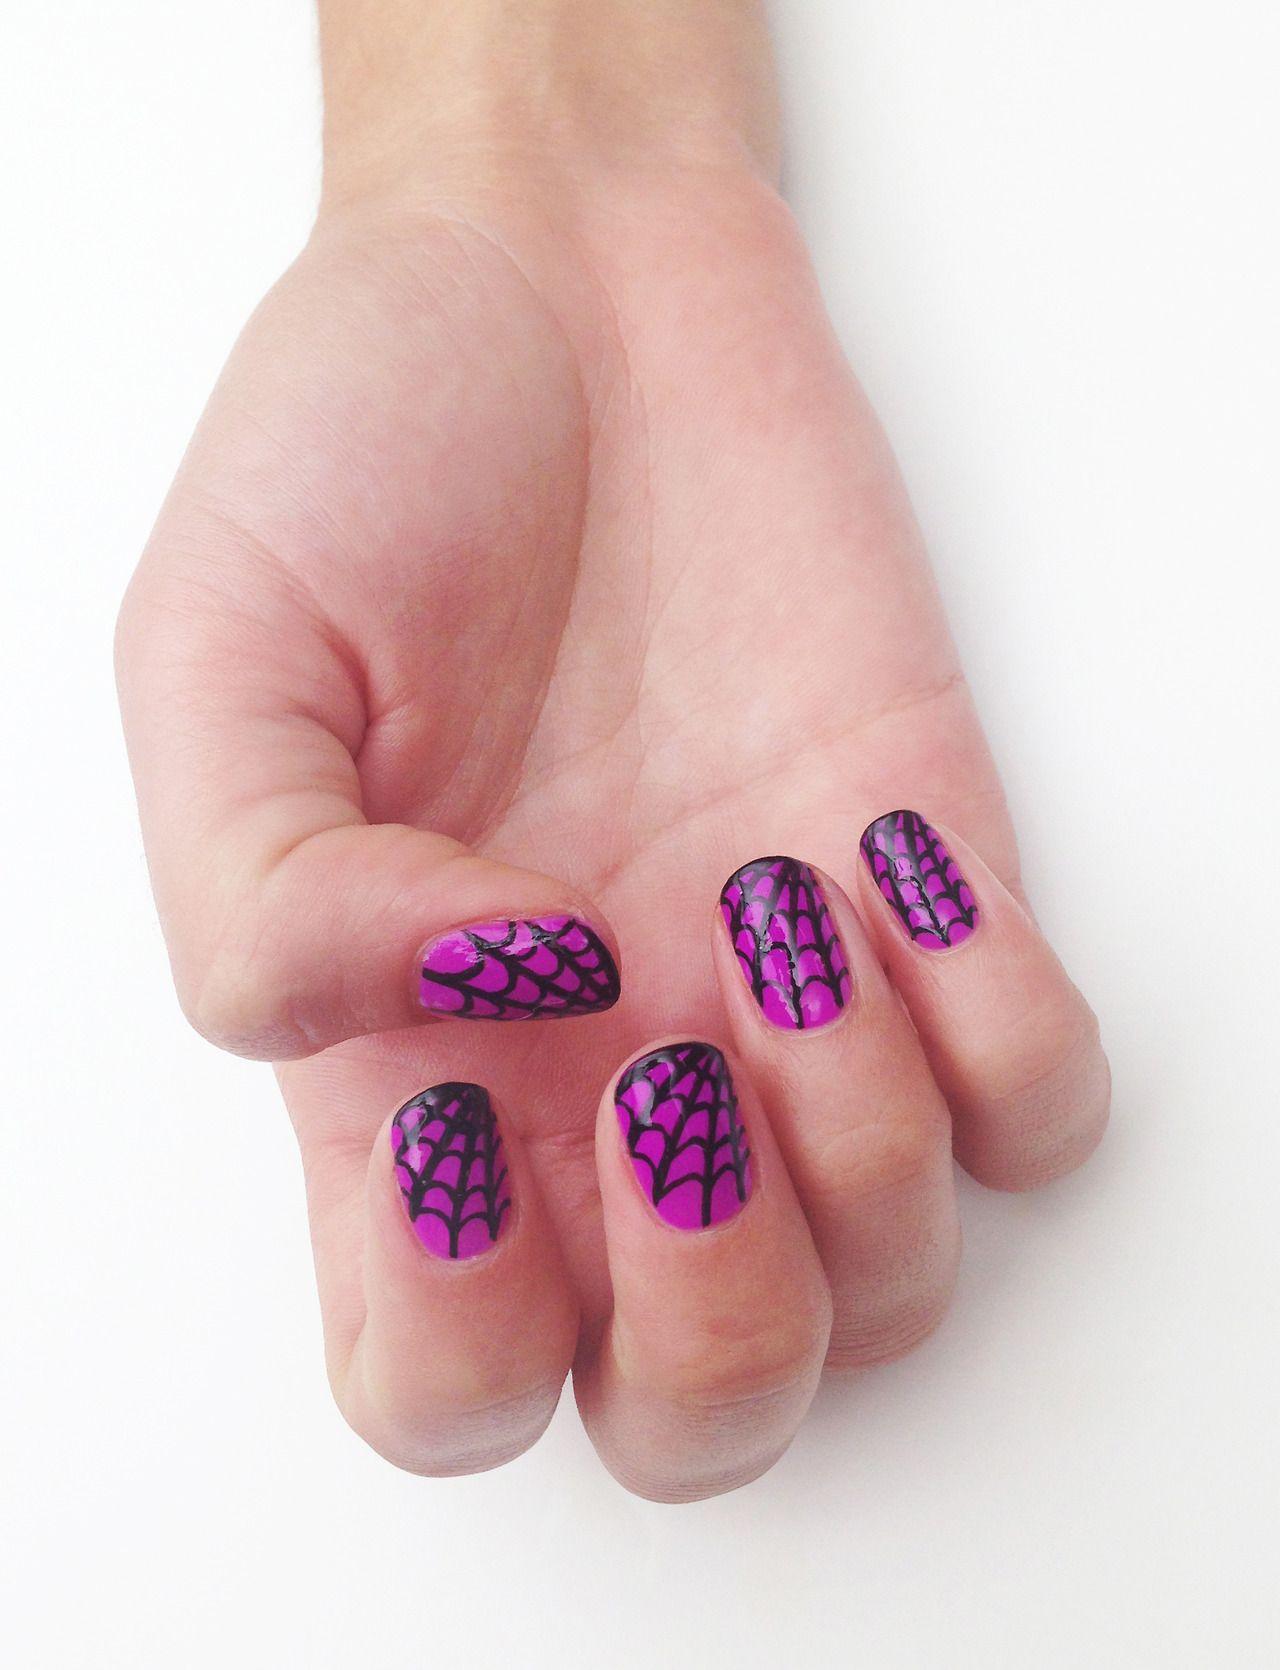 "theillustratednail: Cobweb nails for @ASOS.com.com Magazine ""Nail ..."